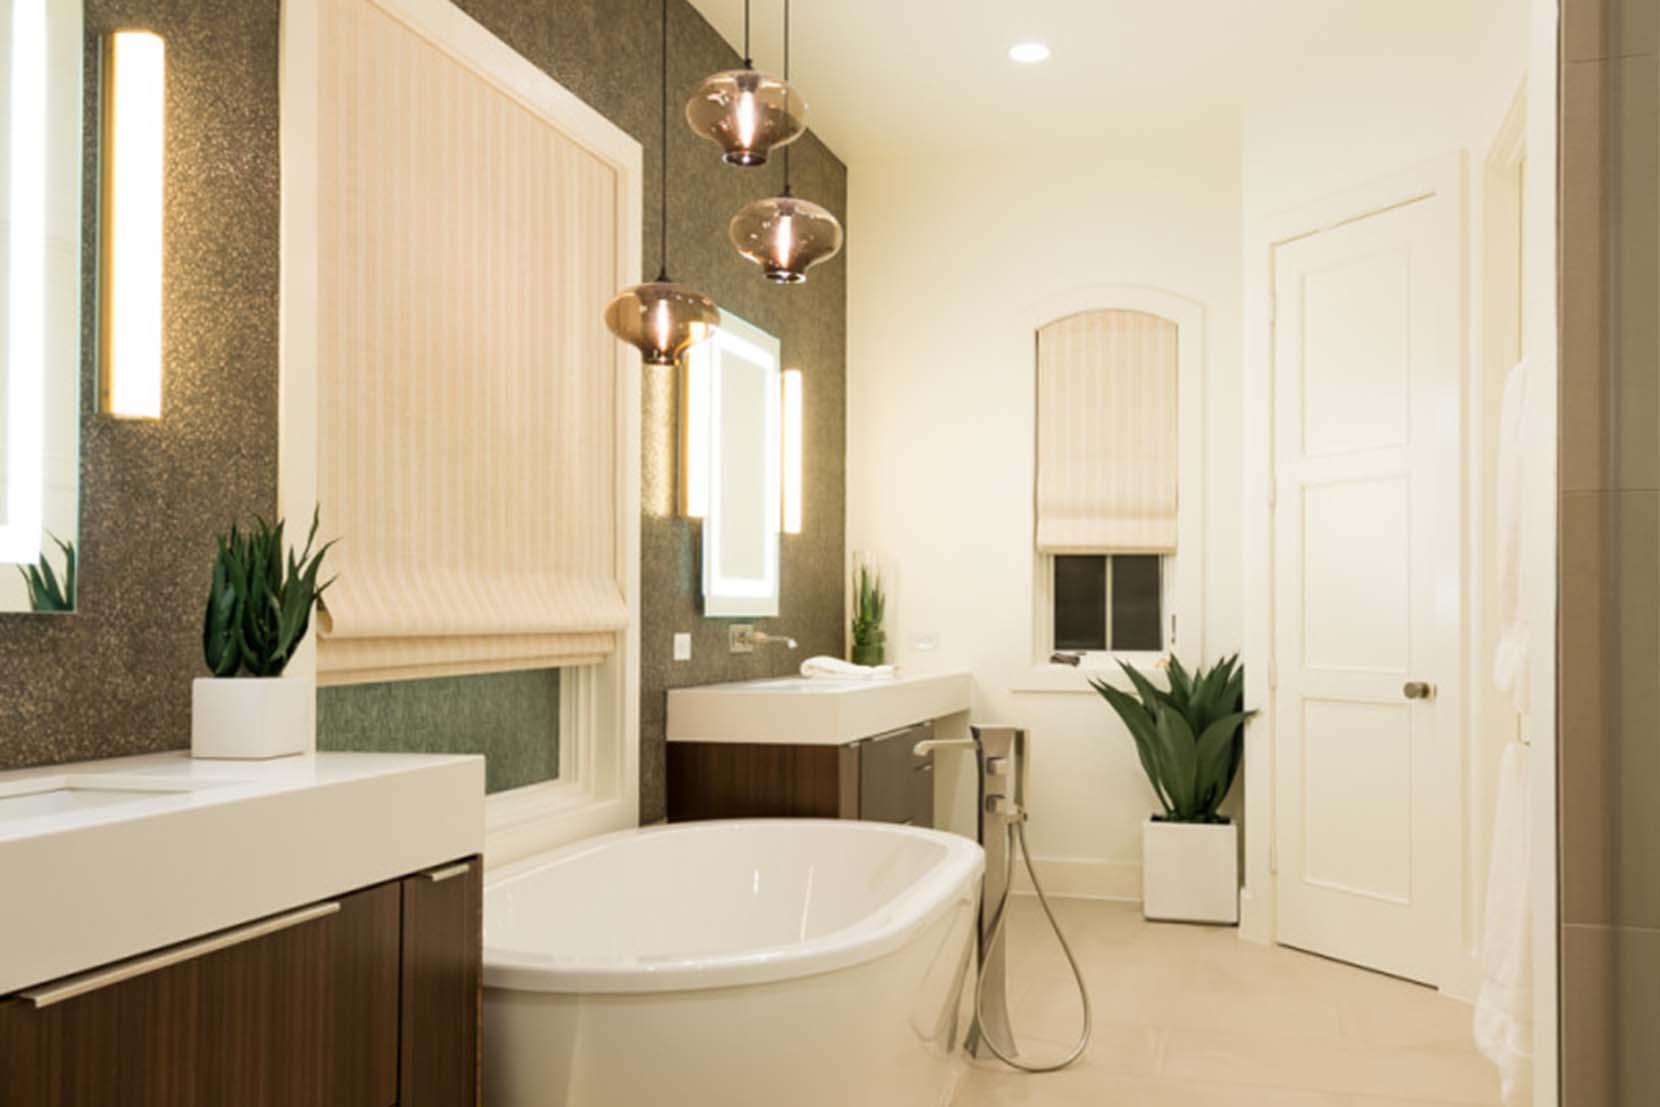 Modern-Bathroom-Pendant-Lighting-Stargazer-Circular-3-Bath.jpg